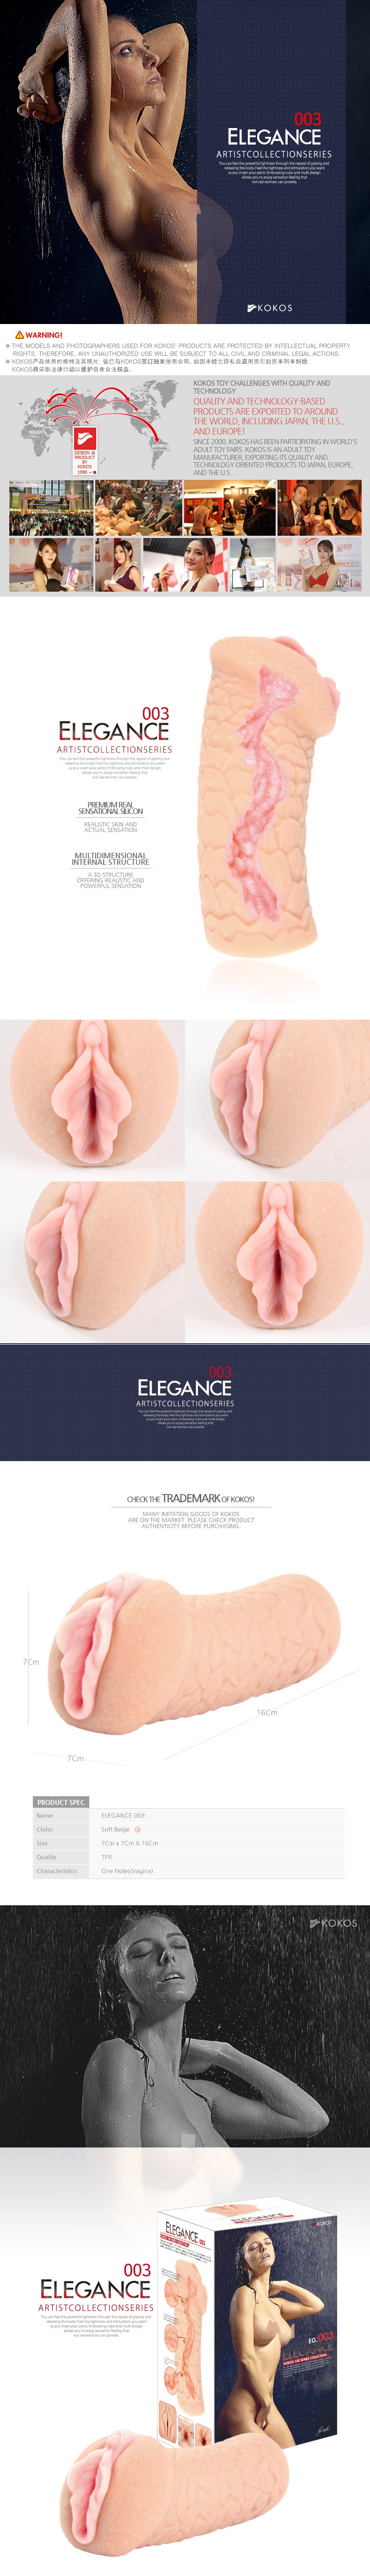 Elegance 003